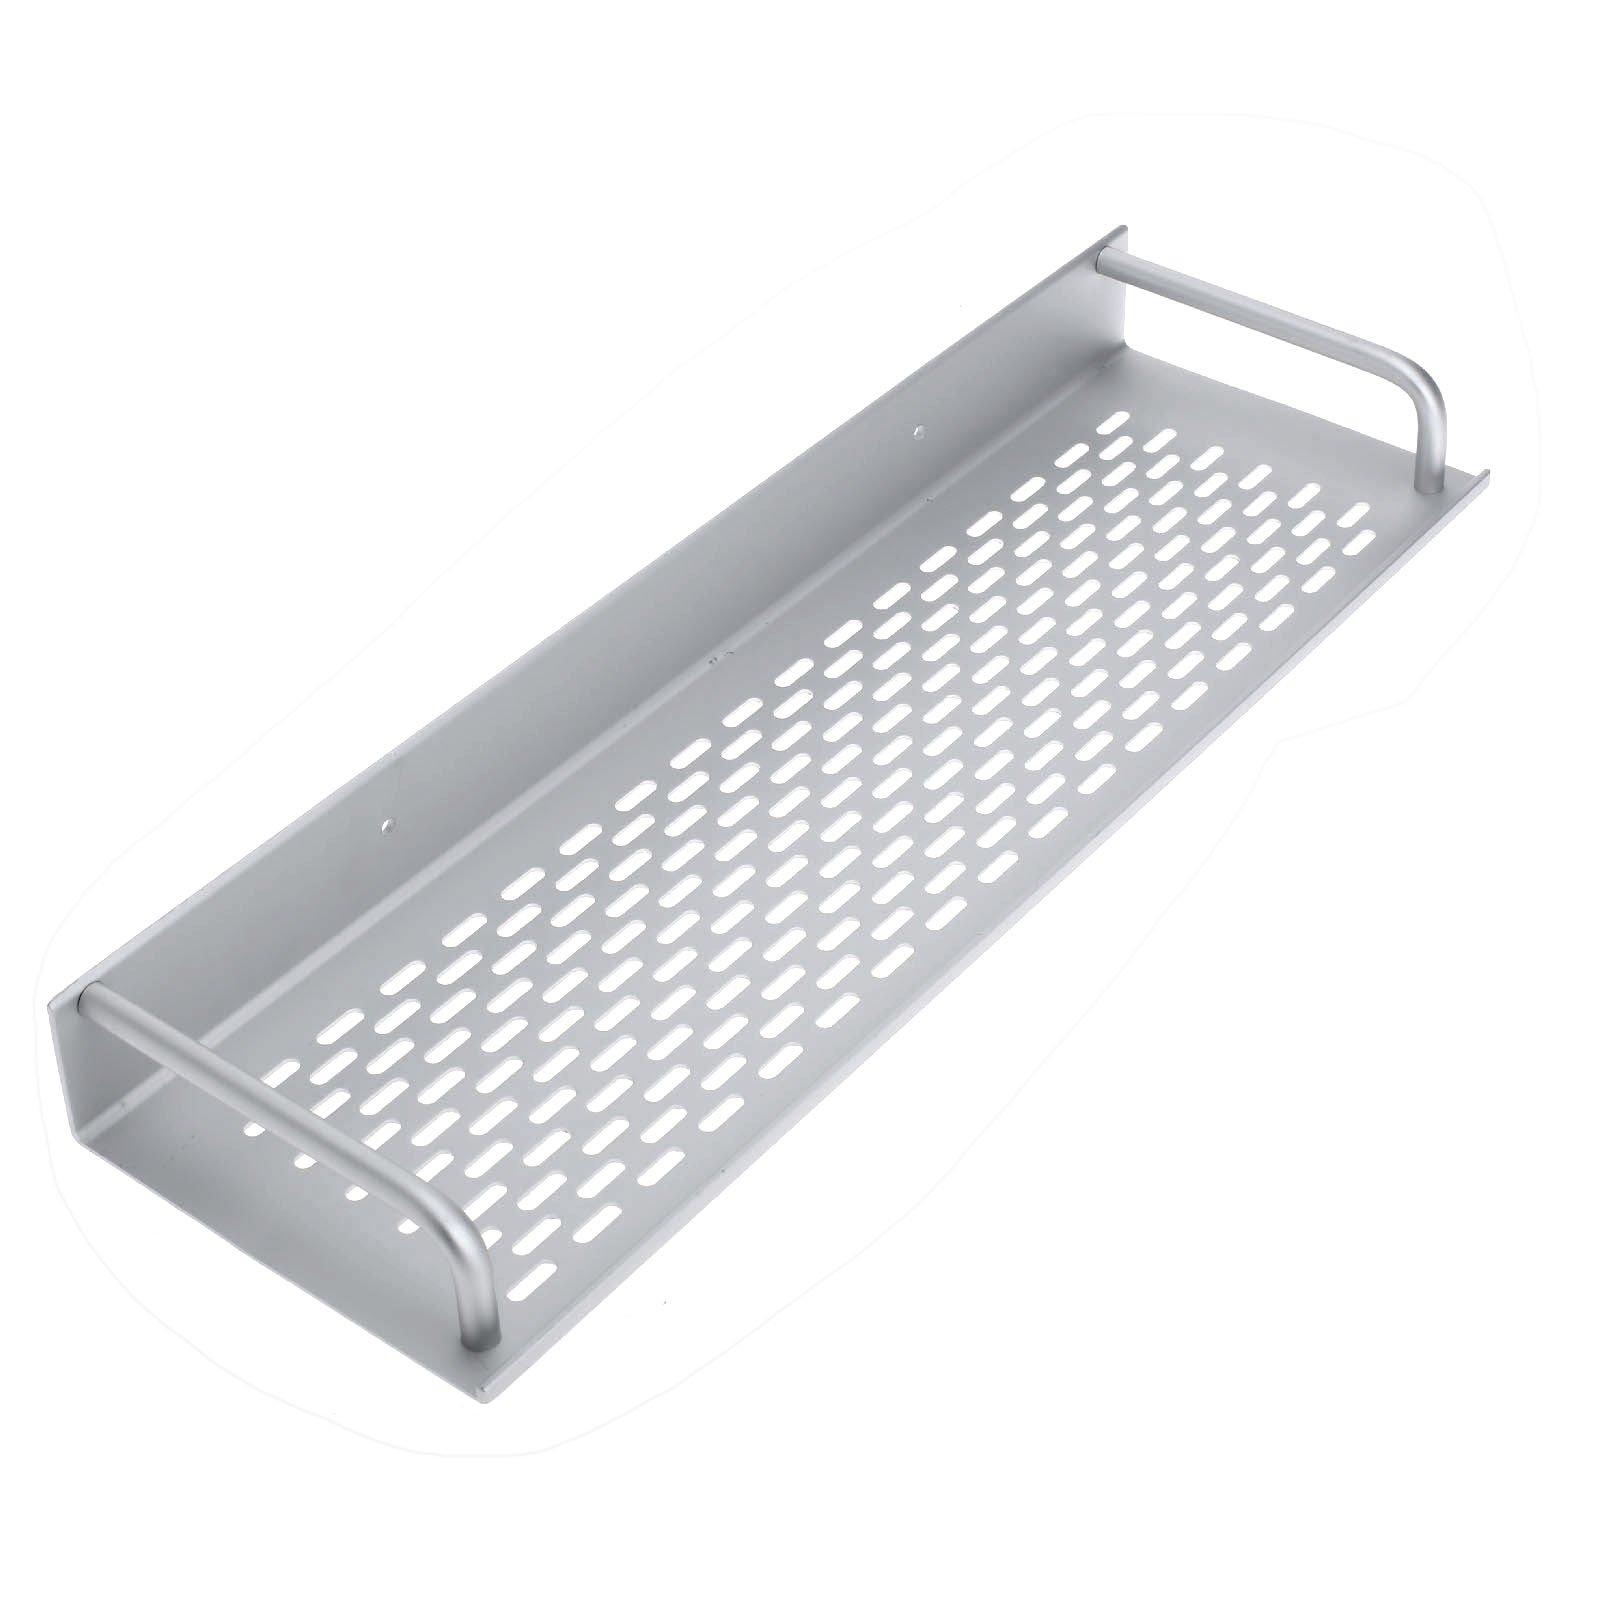 Dophee 40Cm Single Tier Rectangle Bath/Kitchen Rack Aluminum Bathroom Shelf Space Storage For Kitchen Bathroom